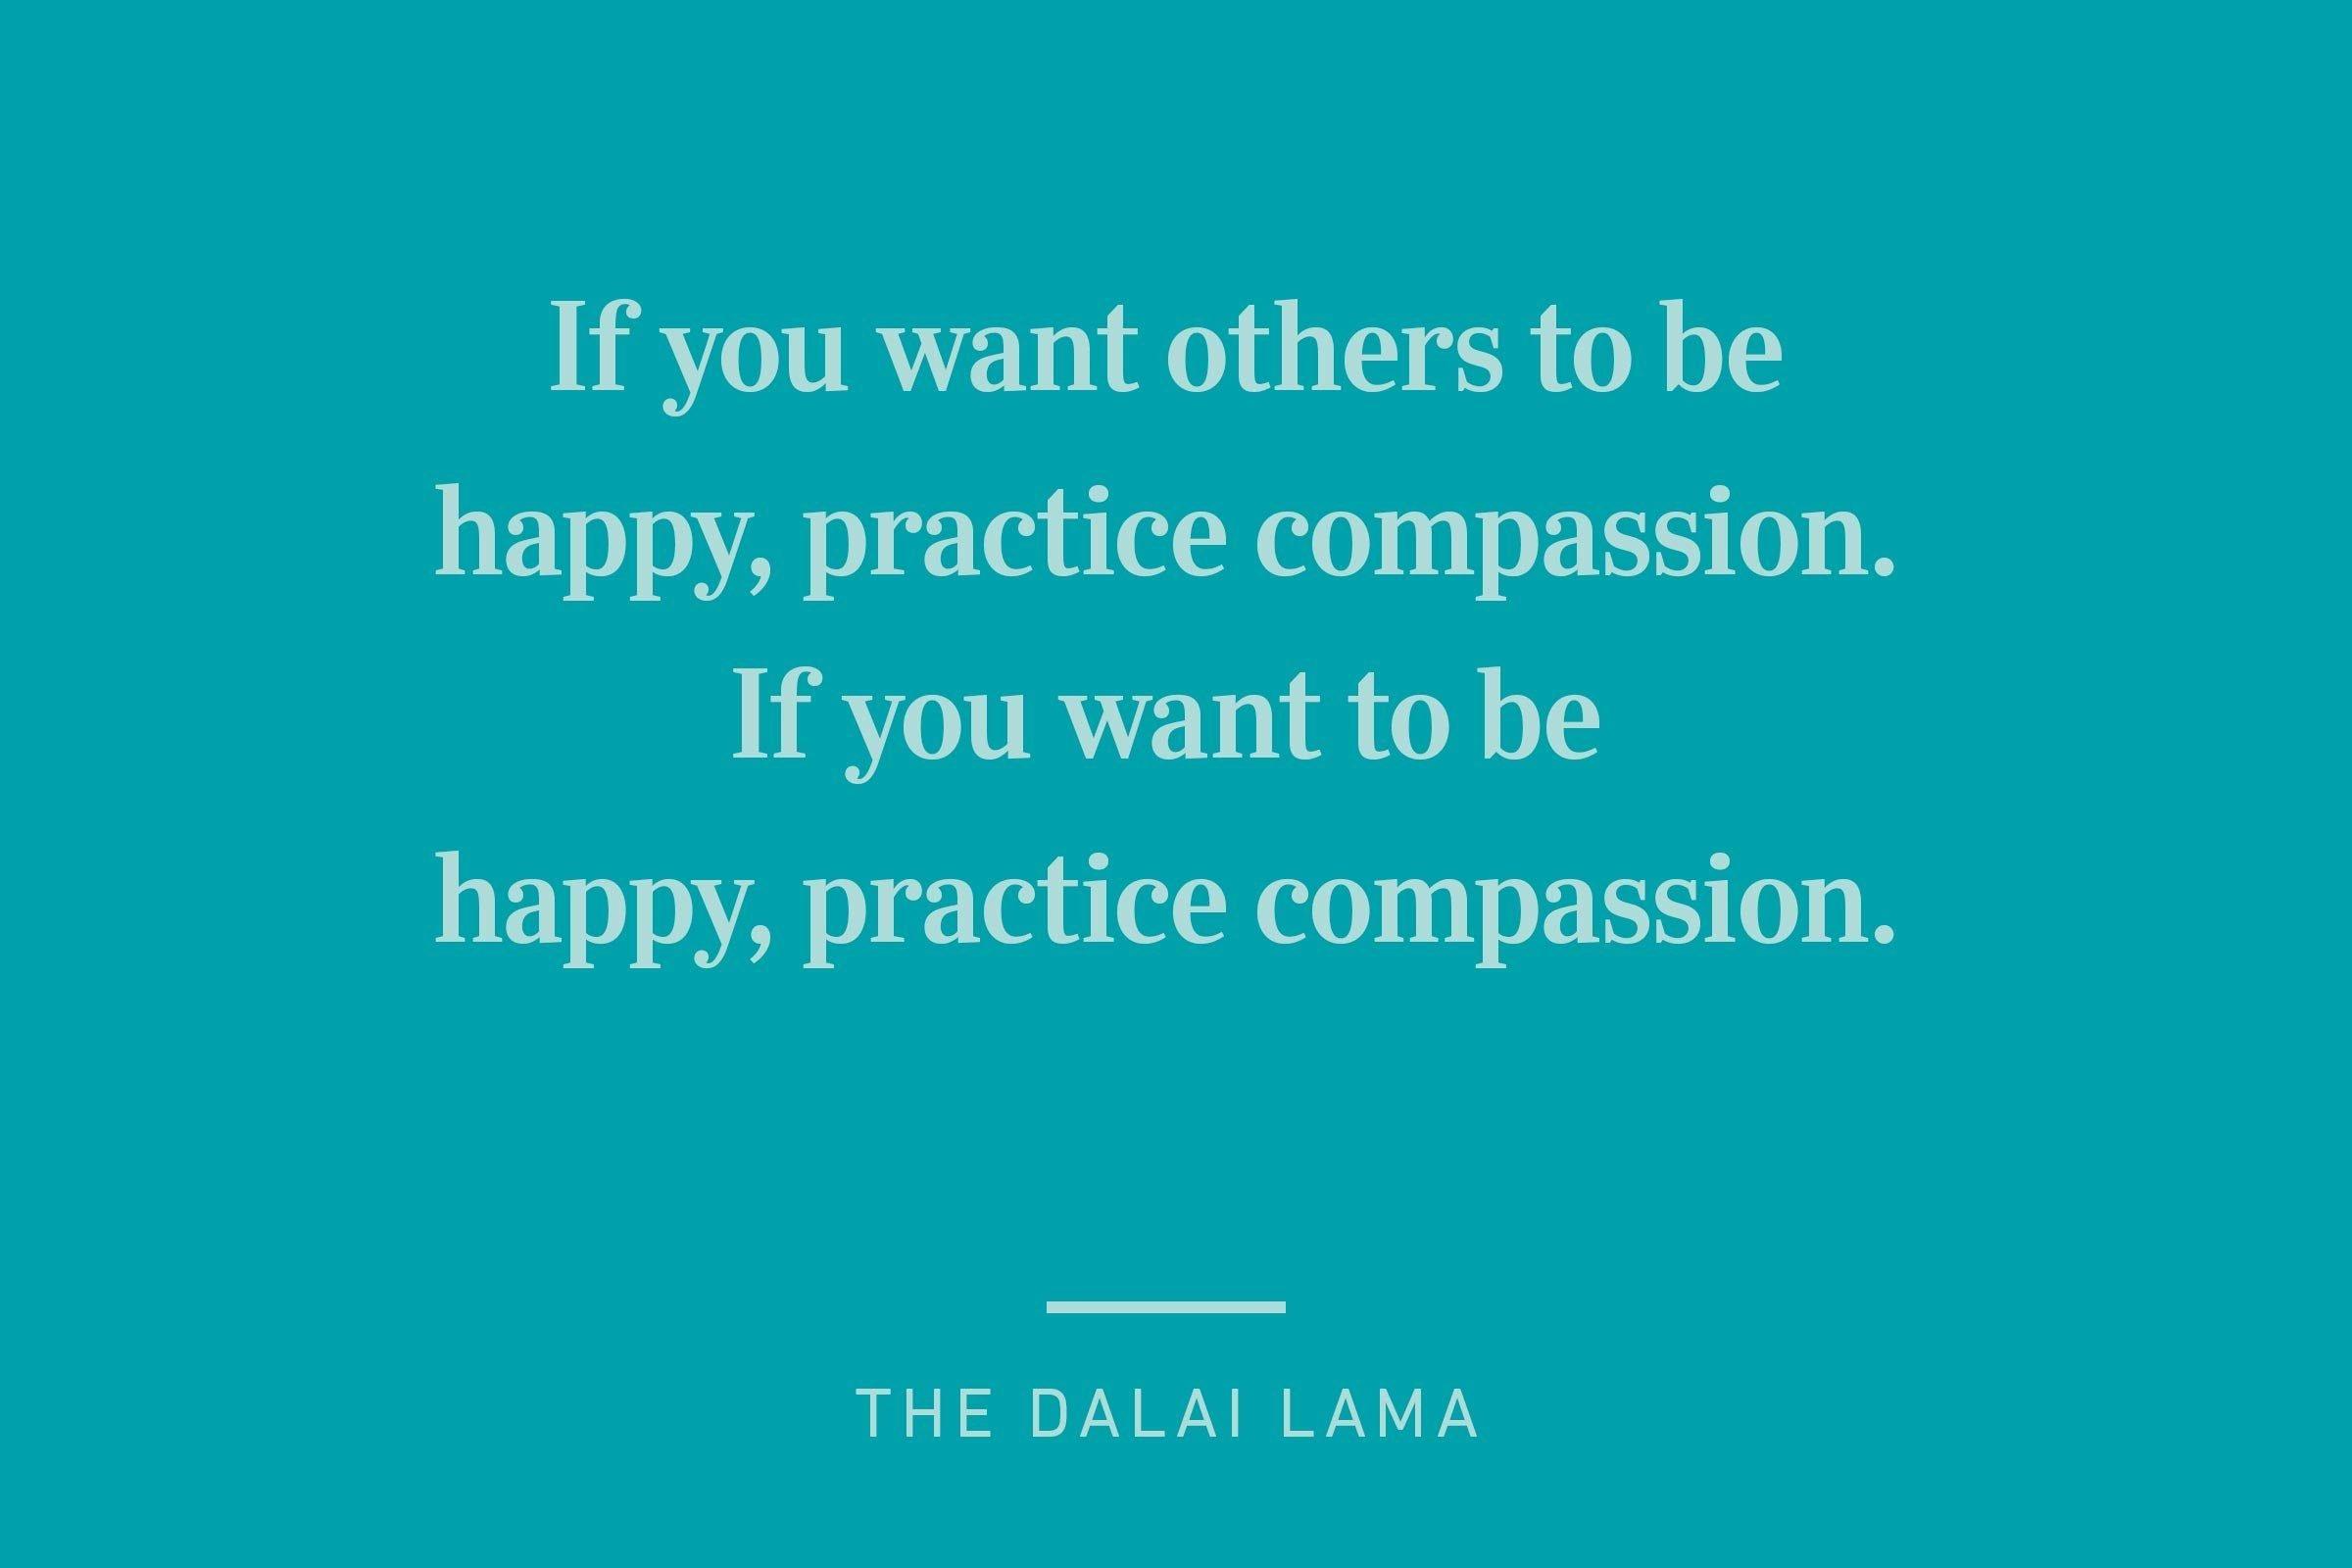 dalai lama happiness quote